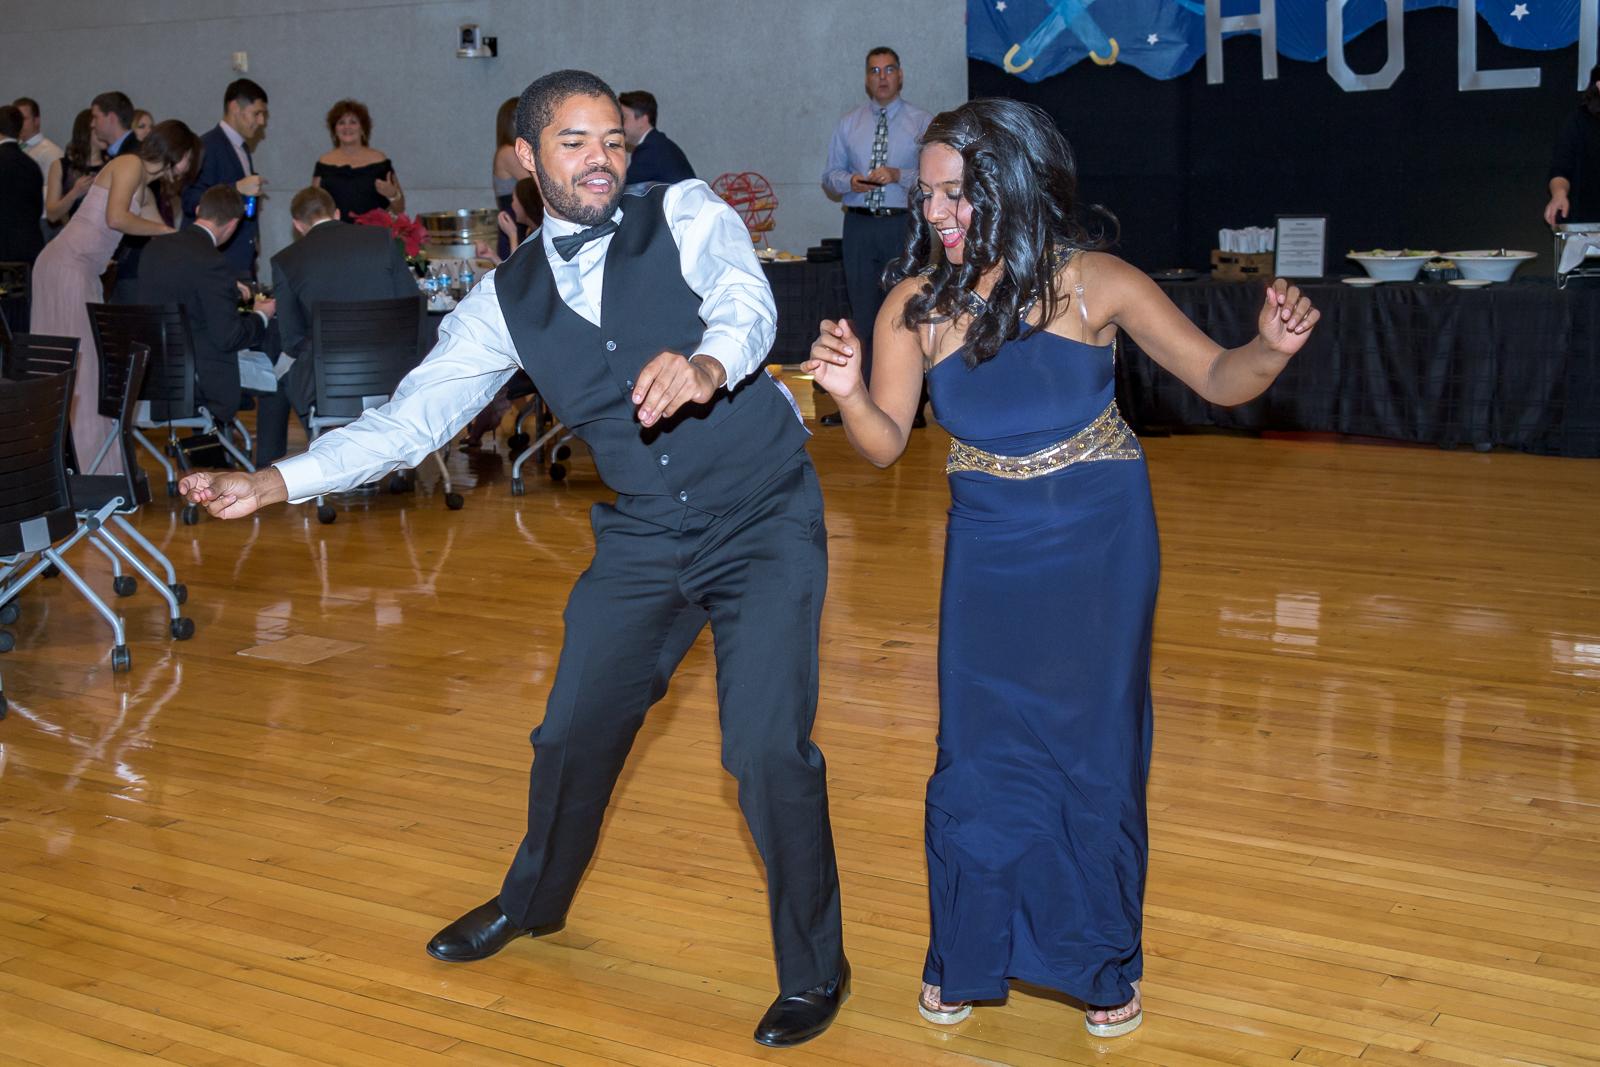 Misra Dancing